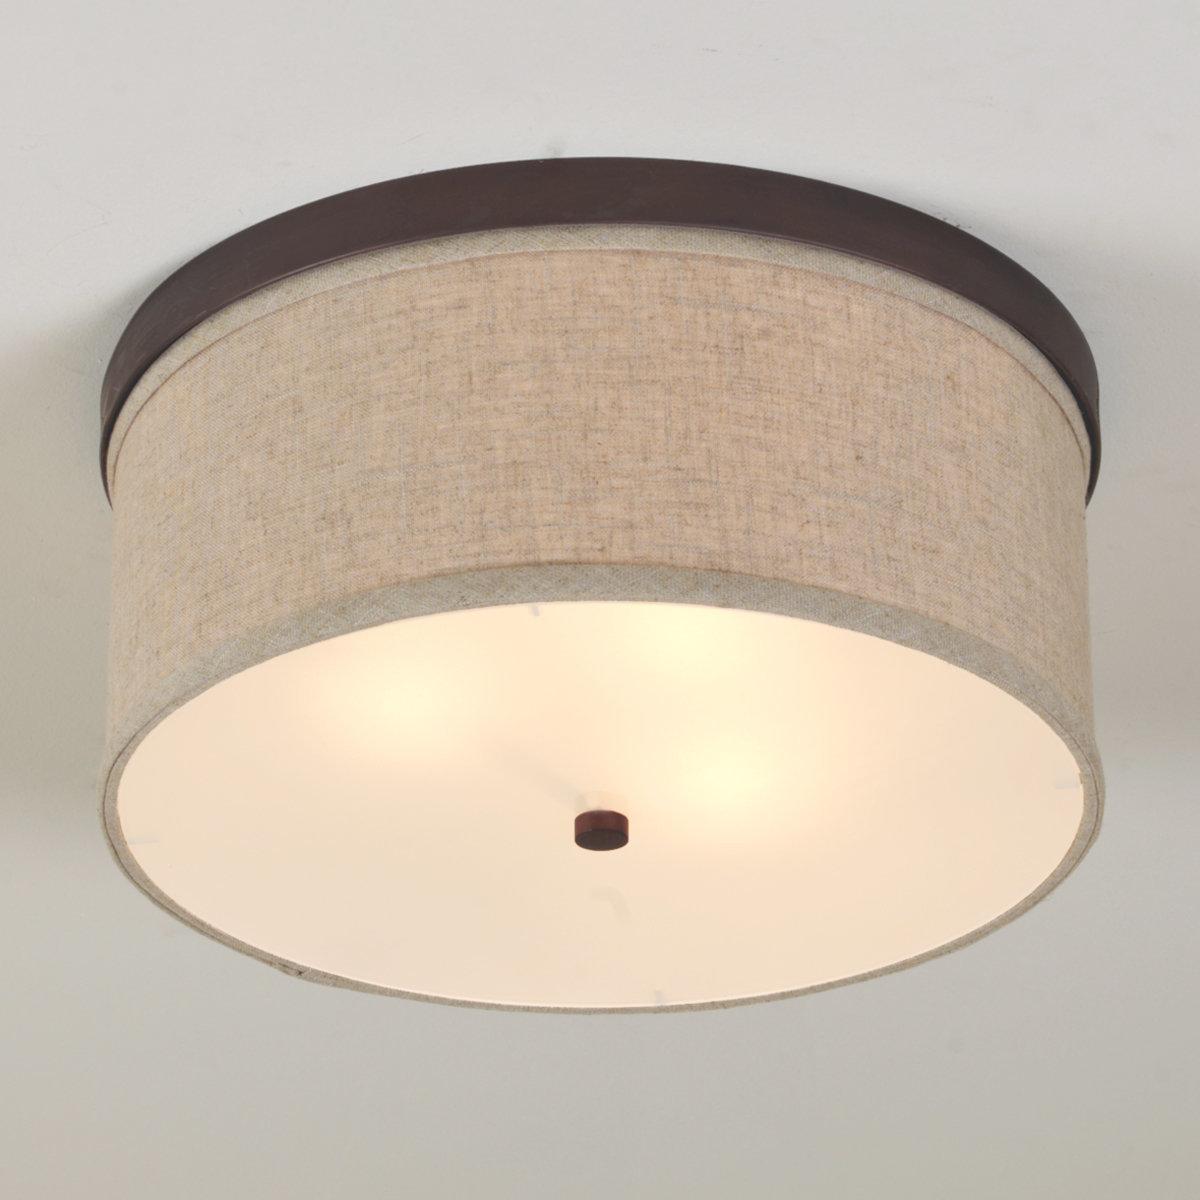 ceiling light shades springfield linen shade ceiling light bronze NTAFBLR